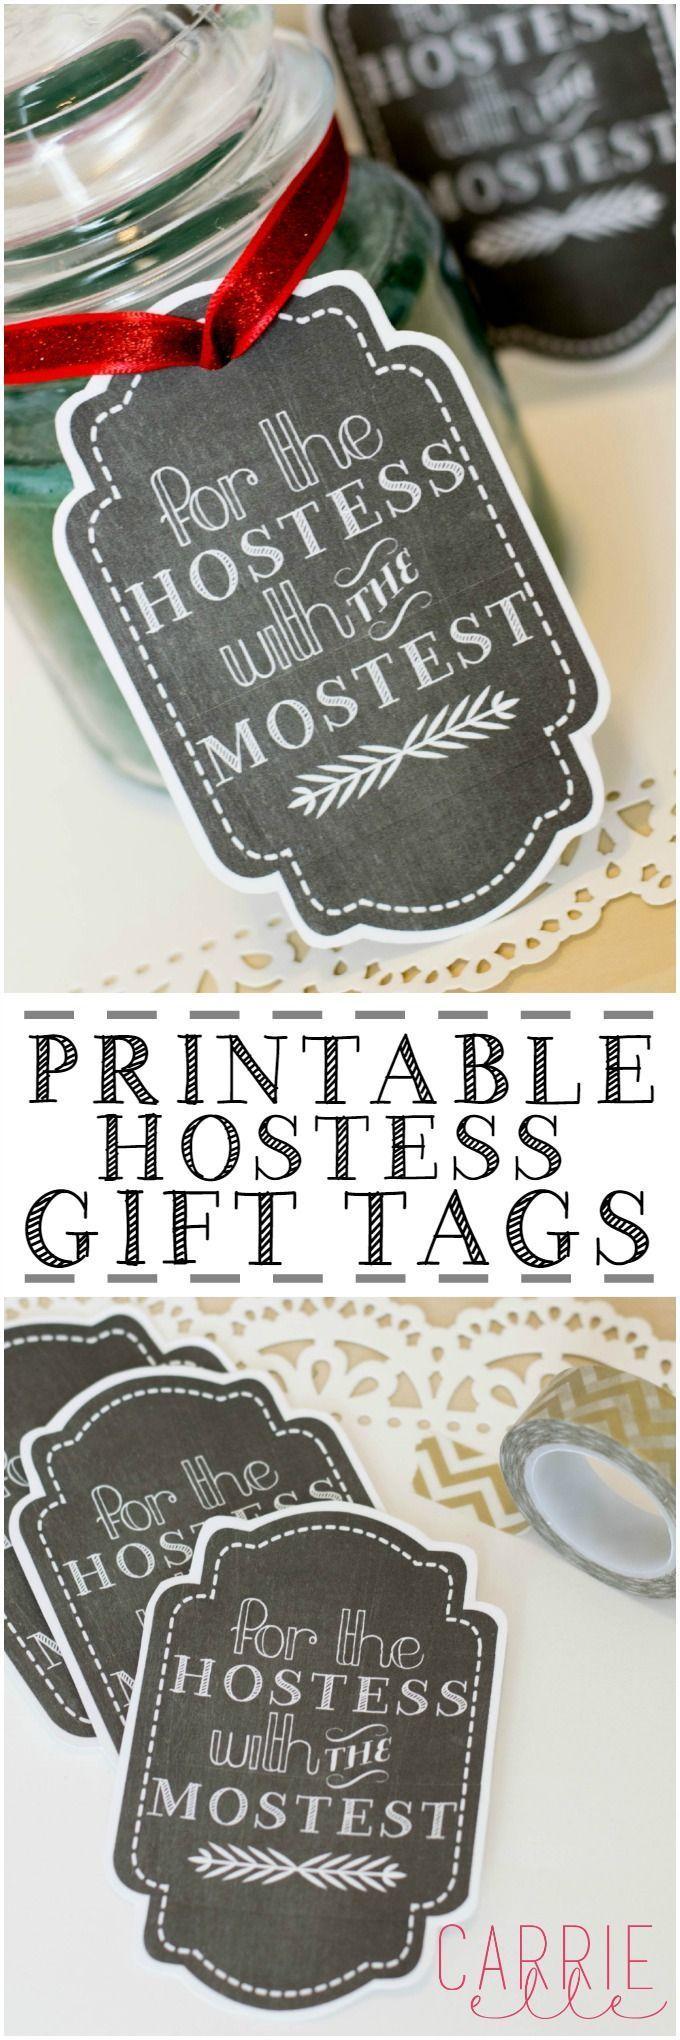 Free Printable Gift Tags: Hostess Gift Tag | Gift Ideas | Pinterest ...